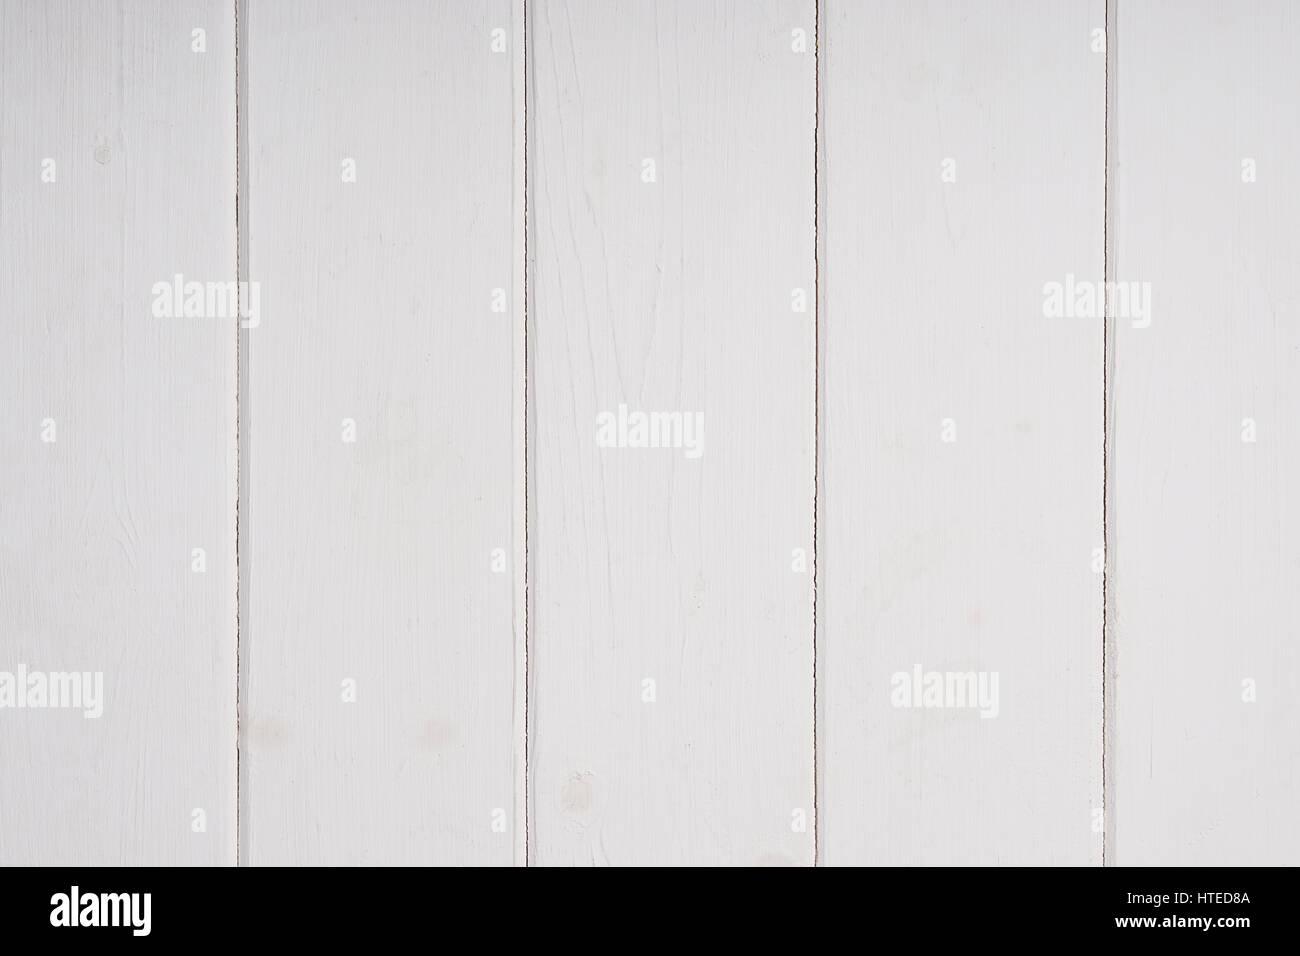 Paneles de pared de madera blanca rústica textura de fondo Imagen De Stock